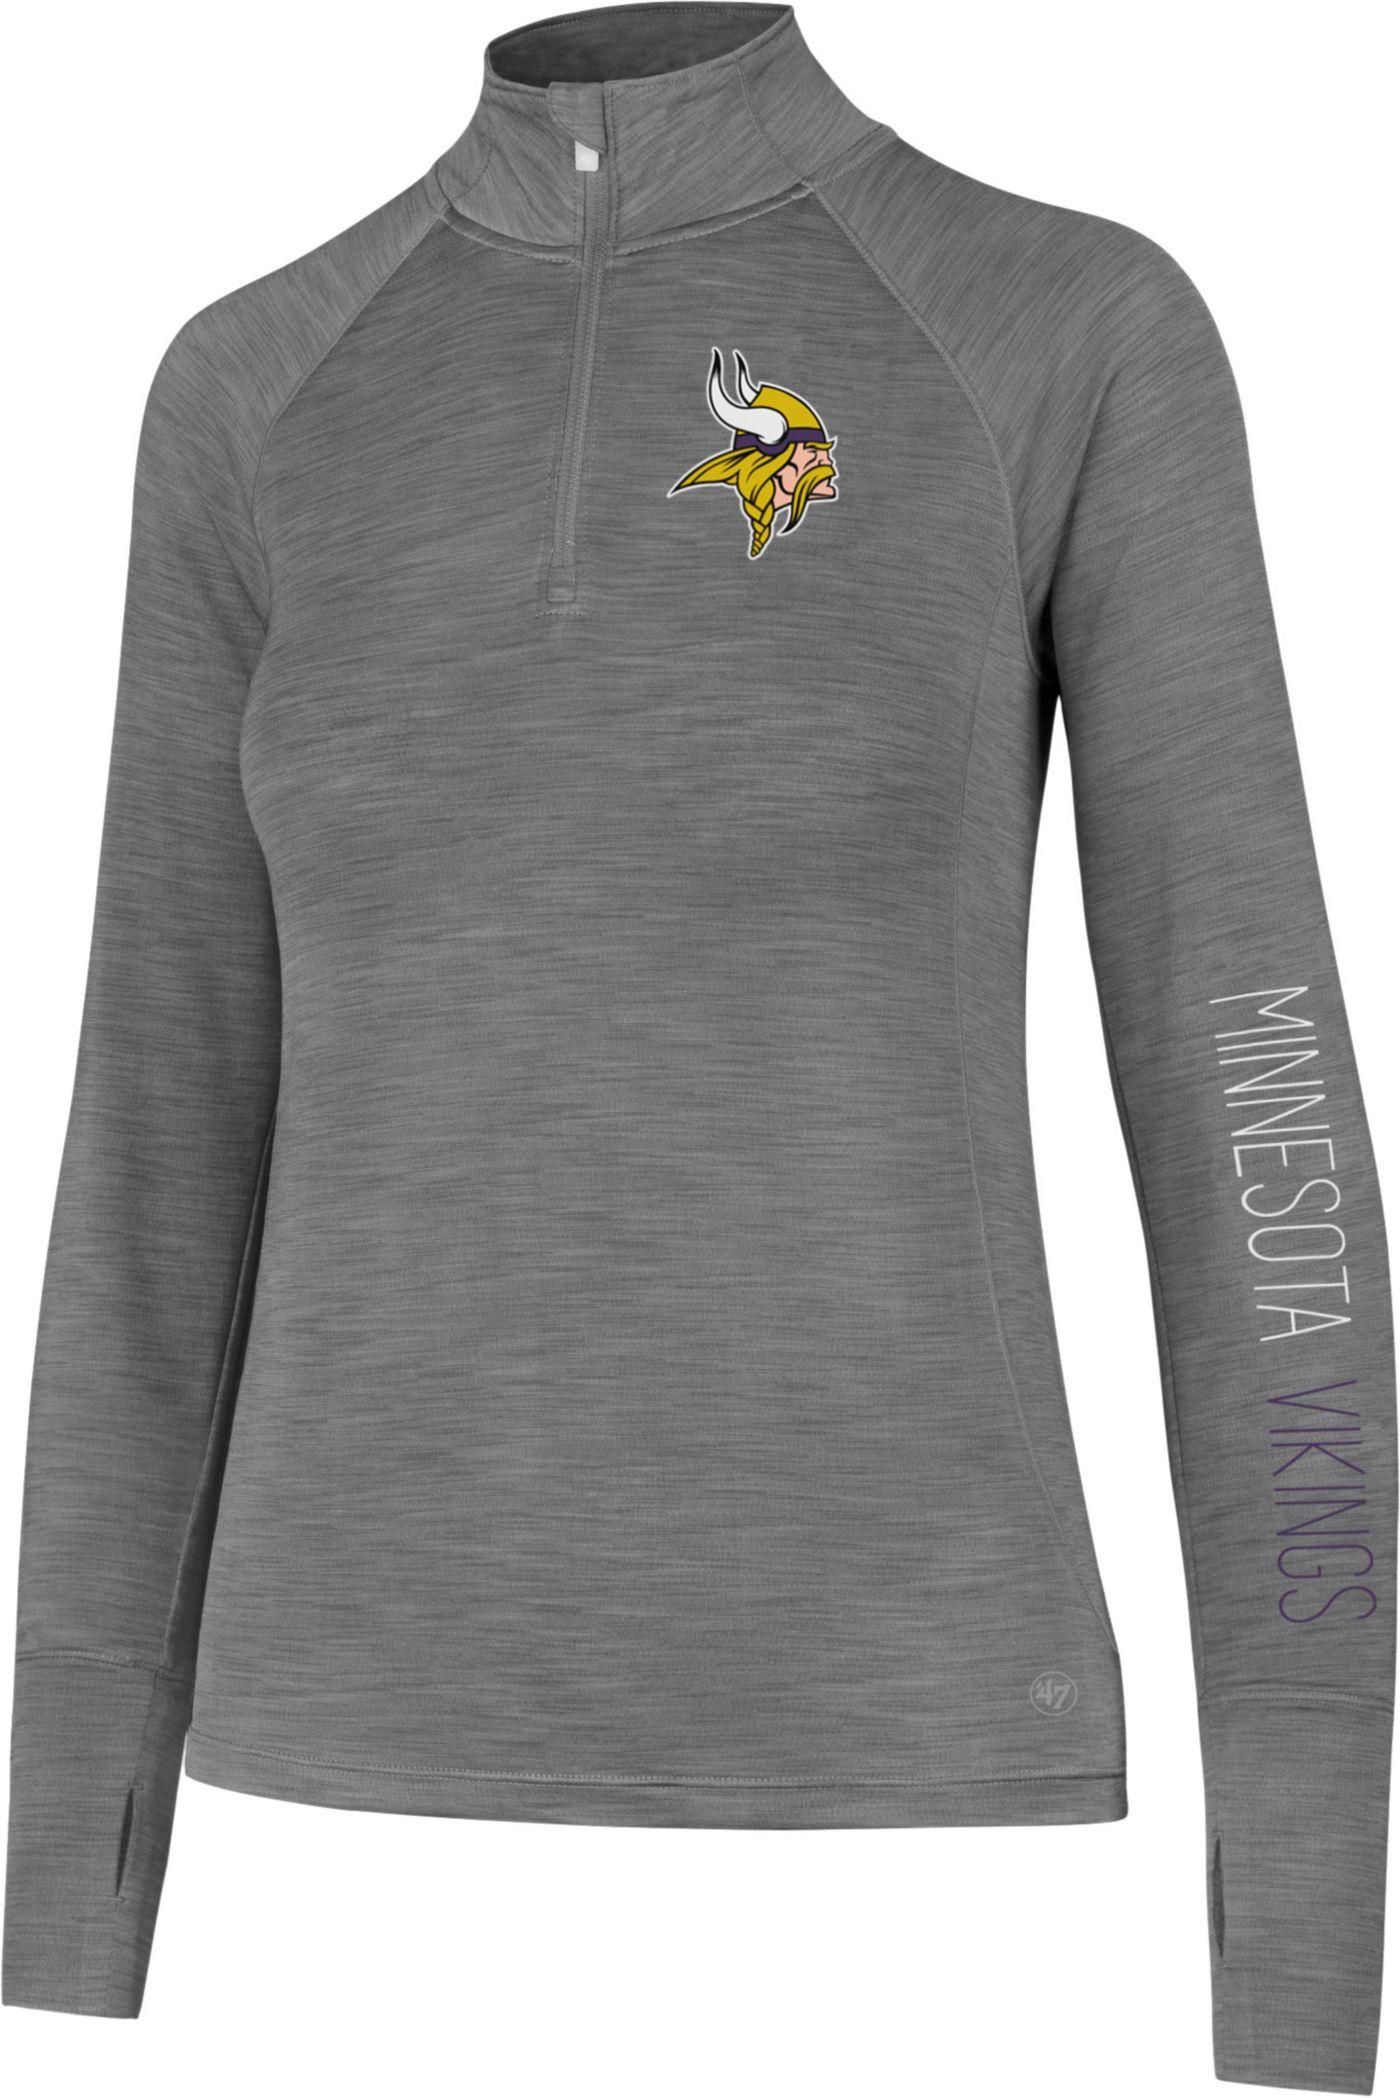 '47 Women's Minnesota Vikings Shade Grey Quarter-Zip Pullover